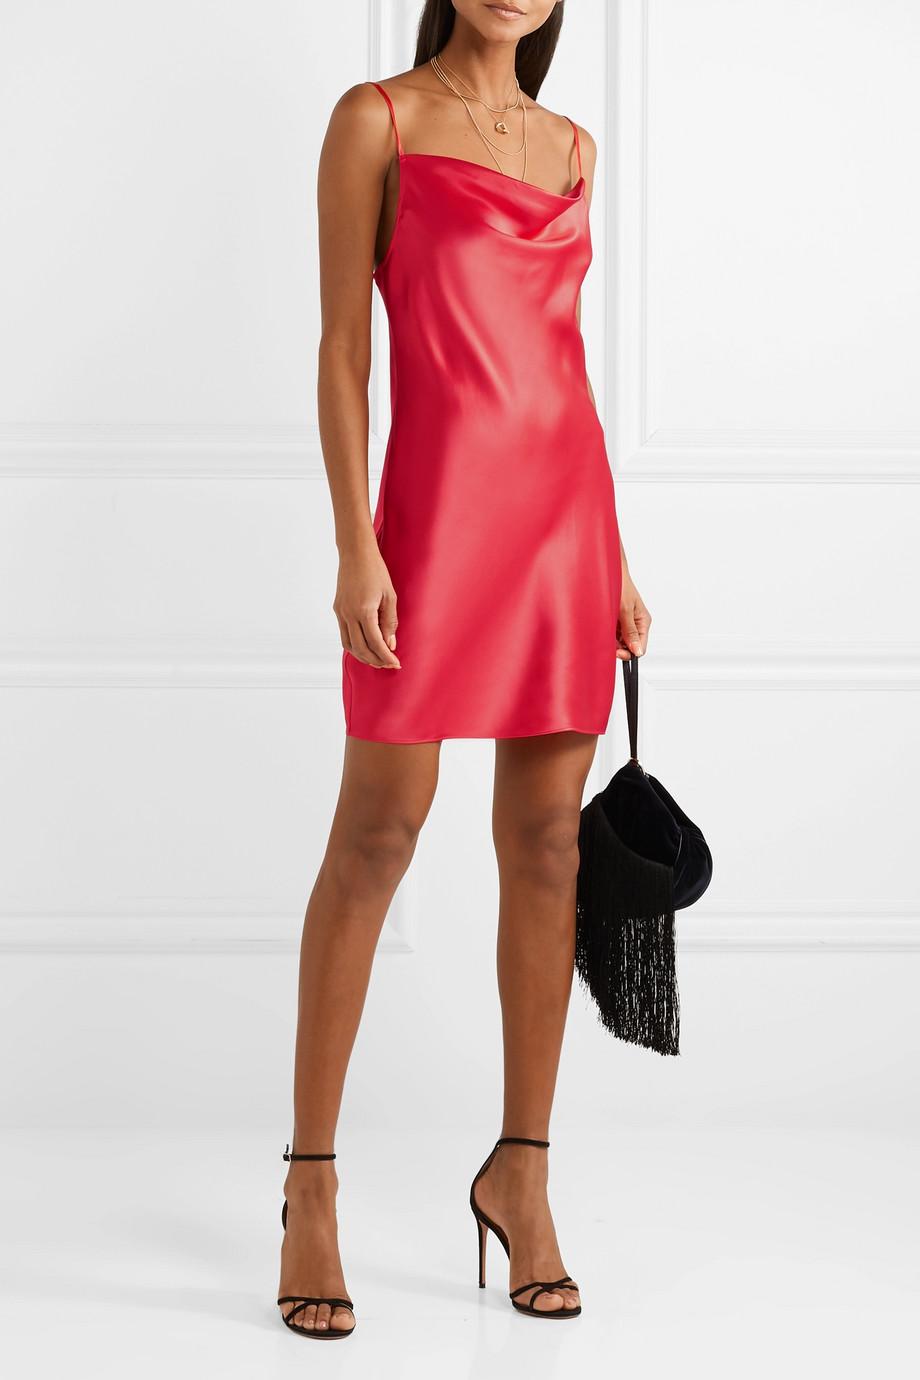 FLEUR DU MAL - Draped Silk-Charmeuse Mini Dress£259.03 GBP